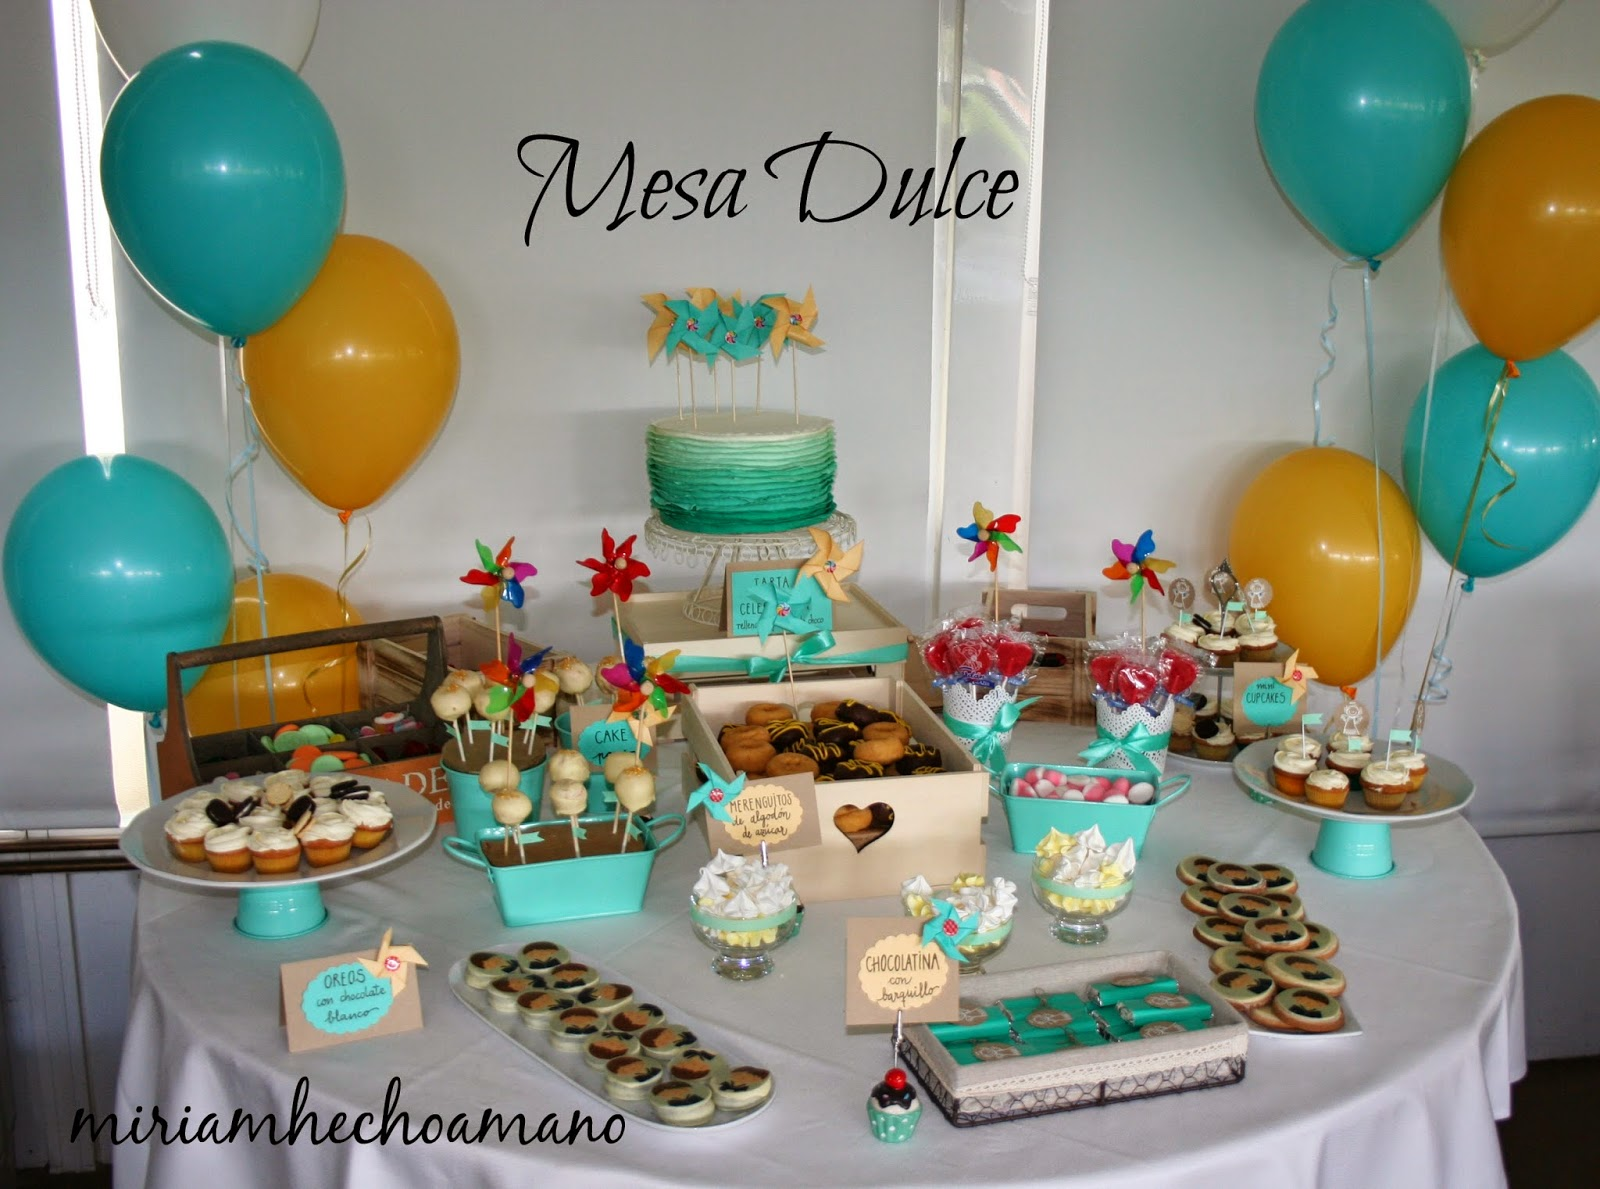 Miriam hecho a mano fiesta de comuni n para ni o mesa dulce - Mesas para comuniones ...